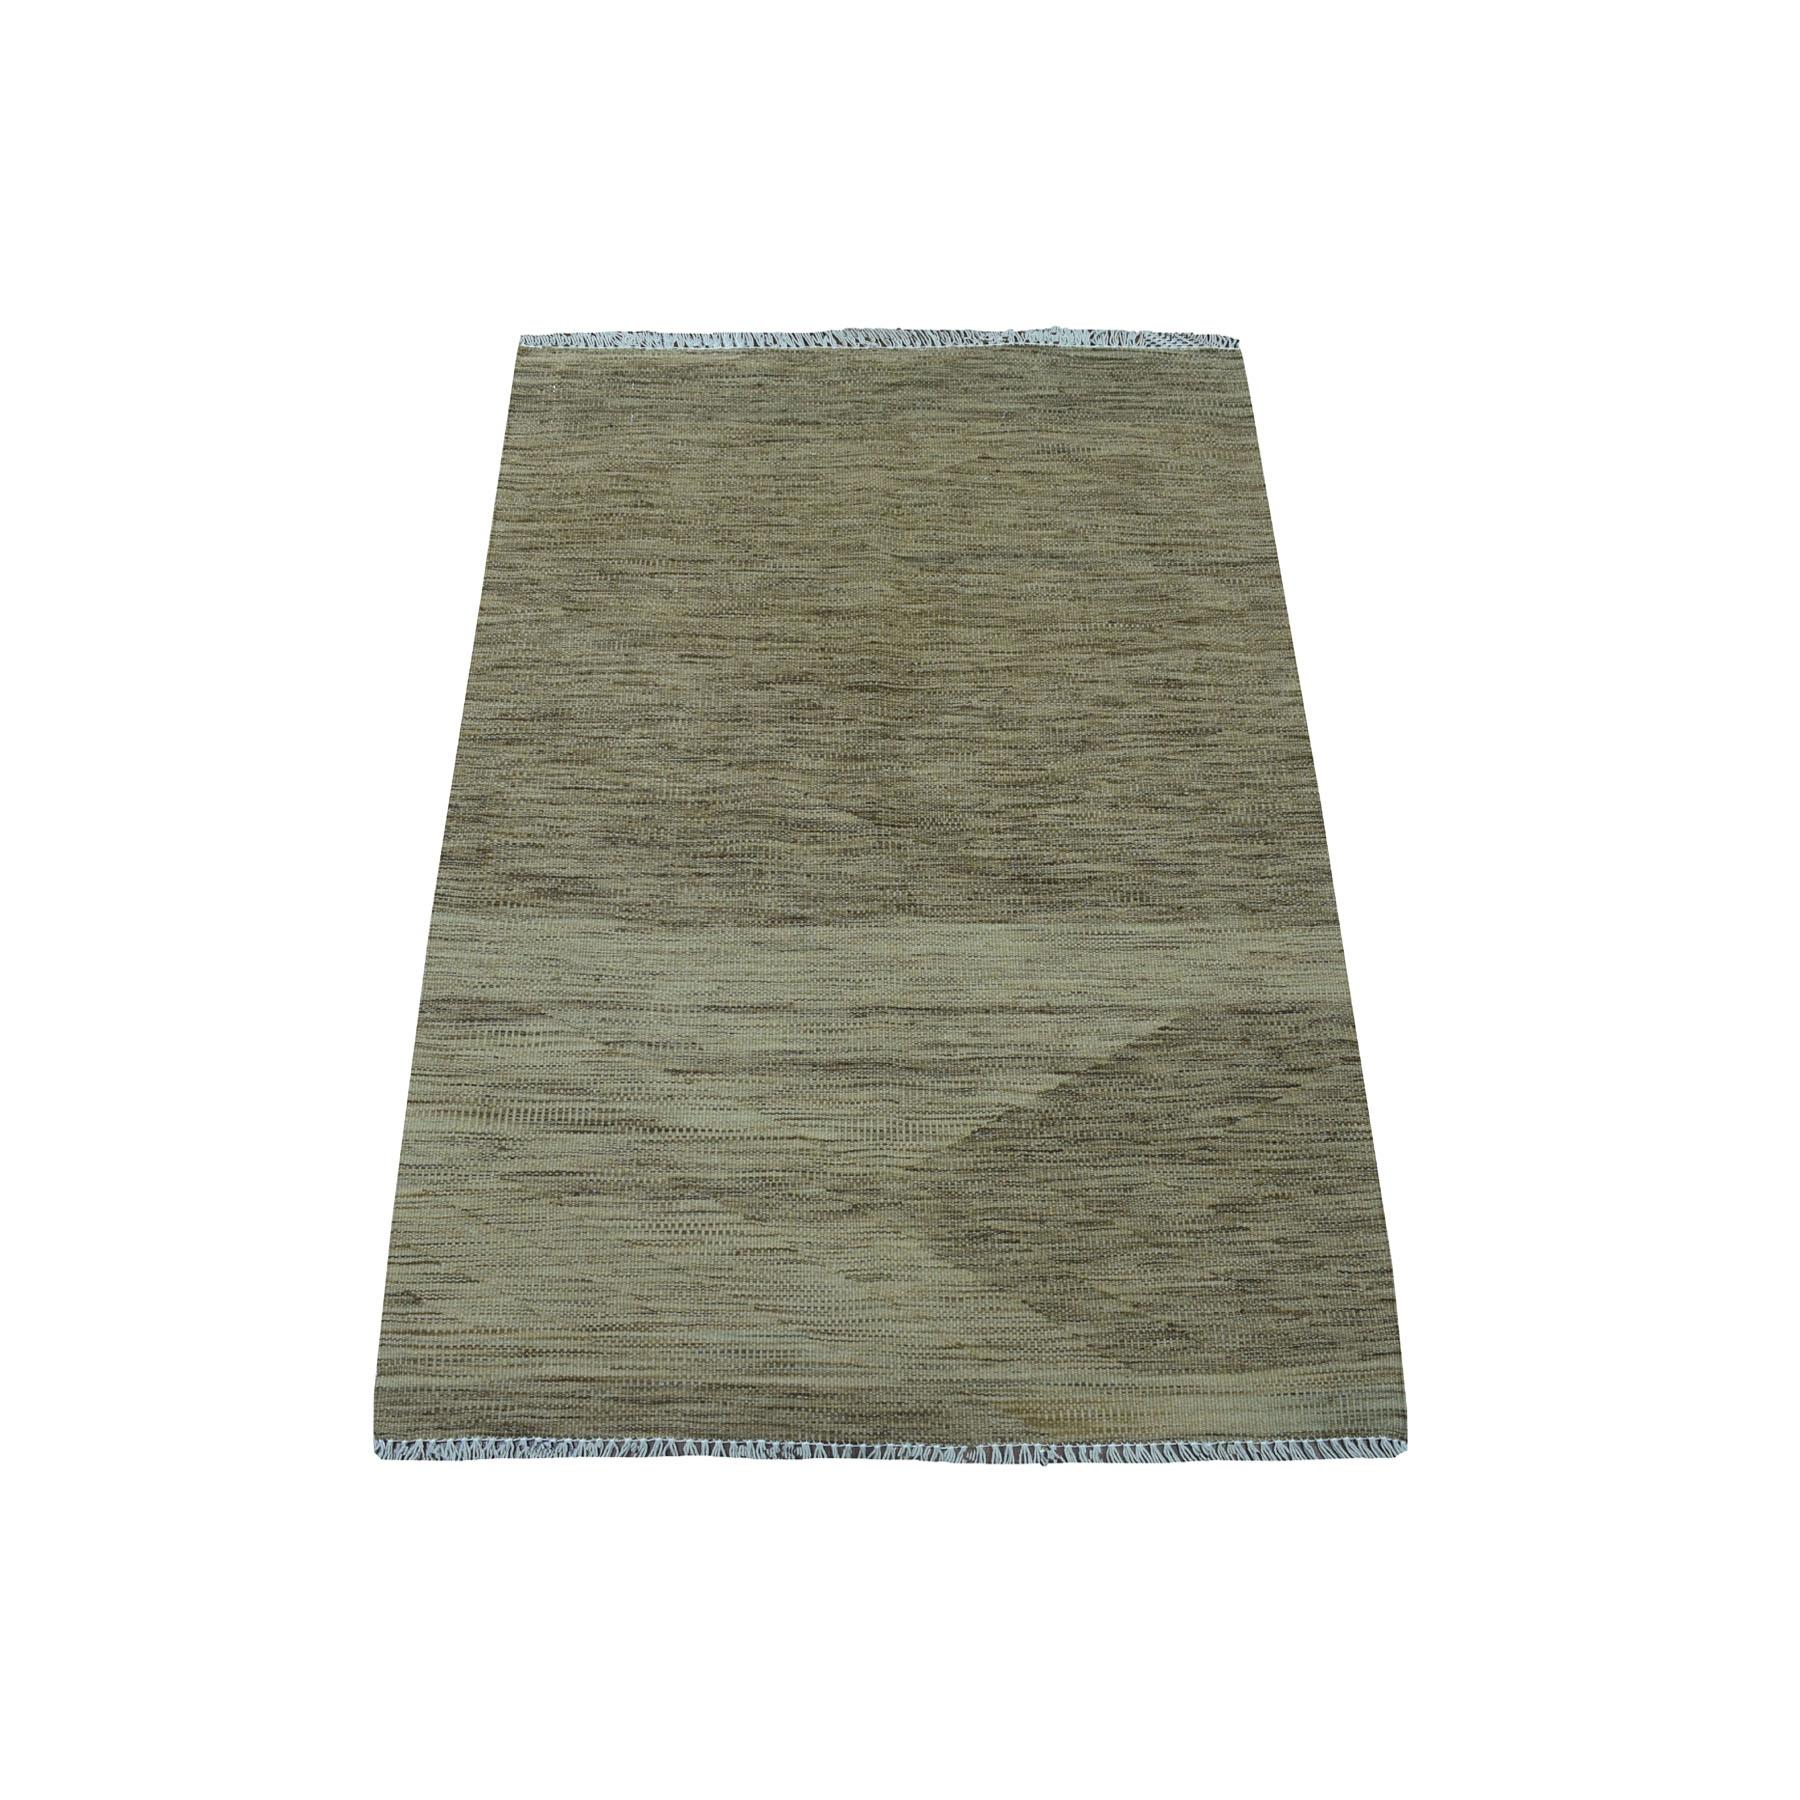 Fine Kilim Collection Hand Woven Grey Rug No: 01107672